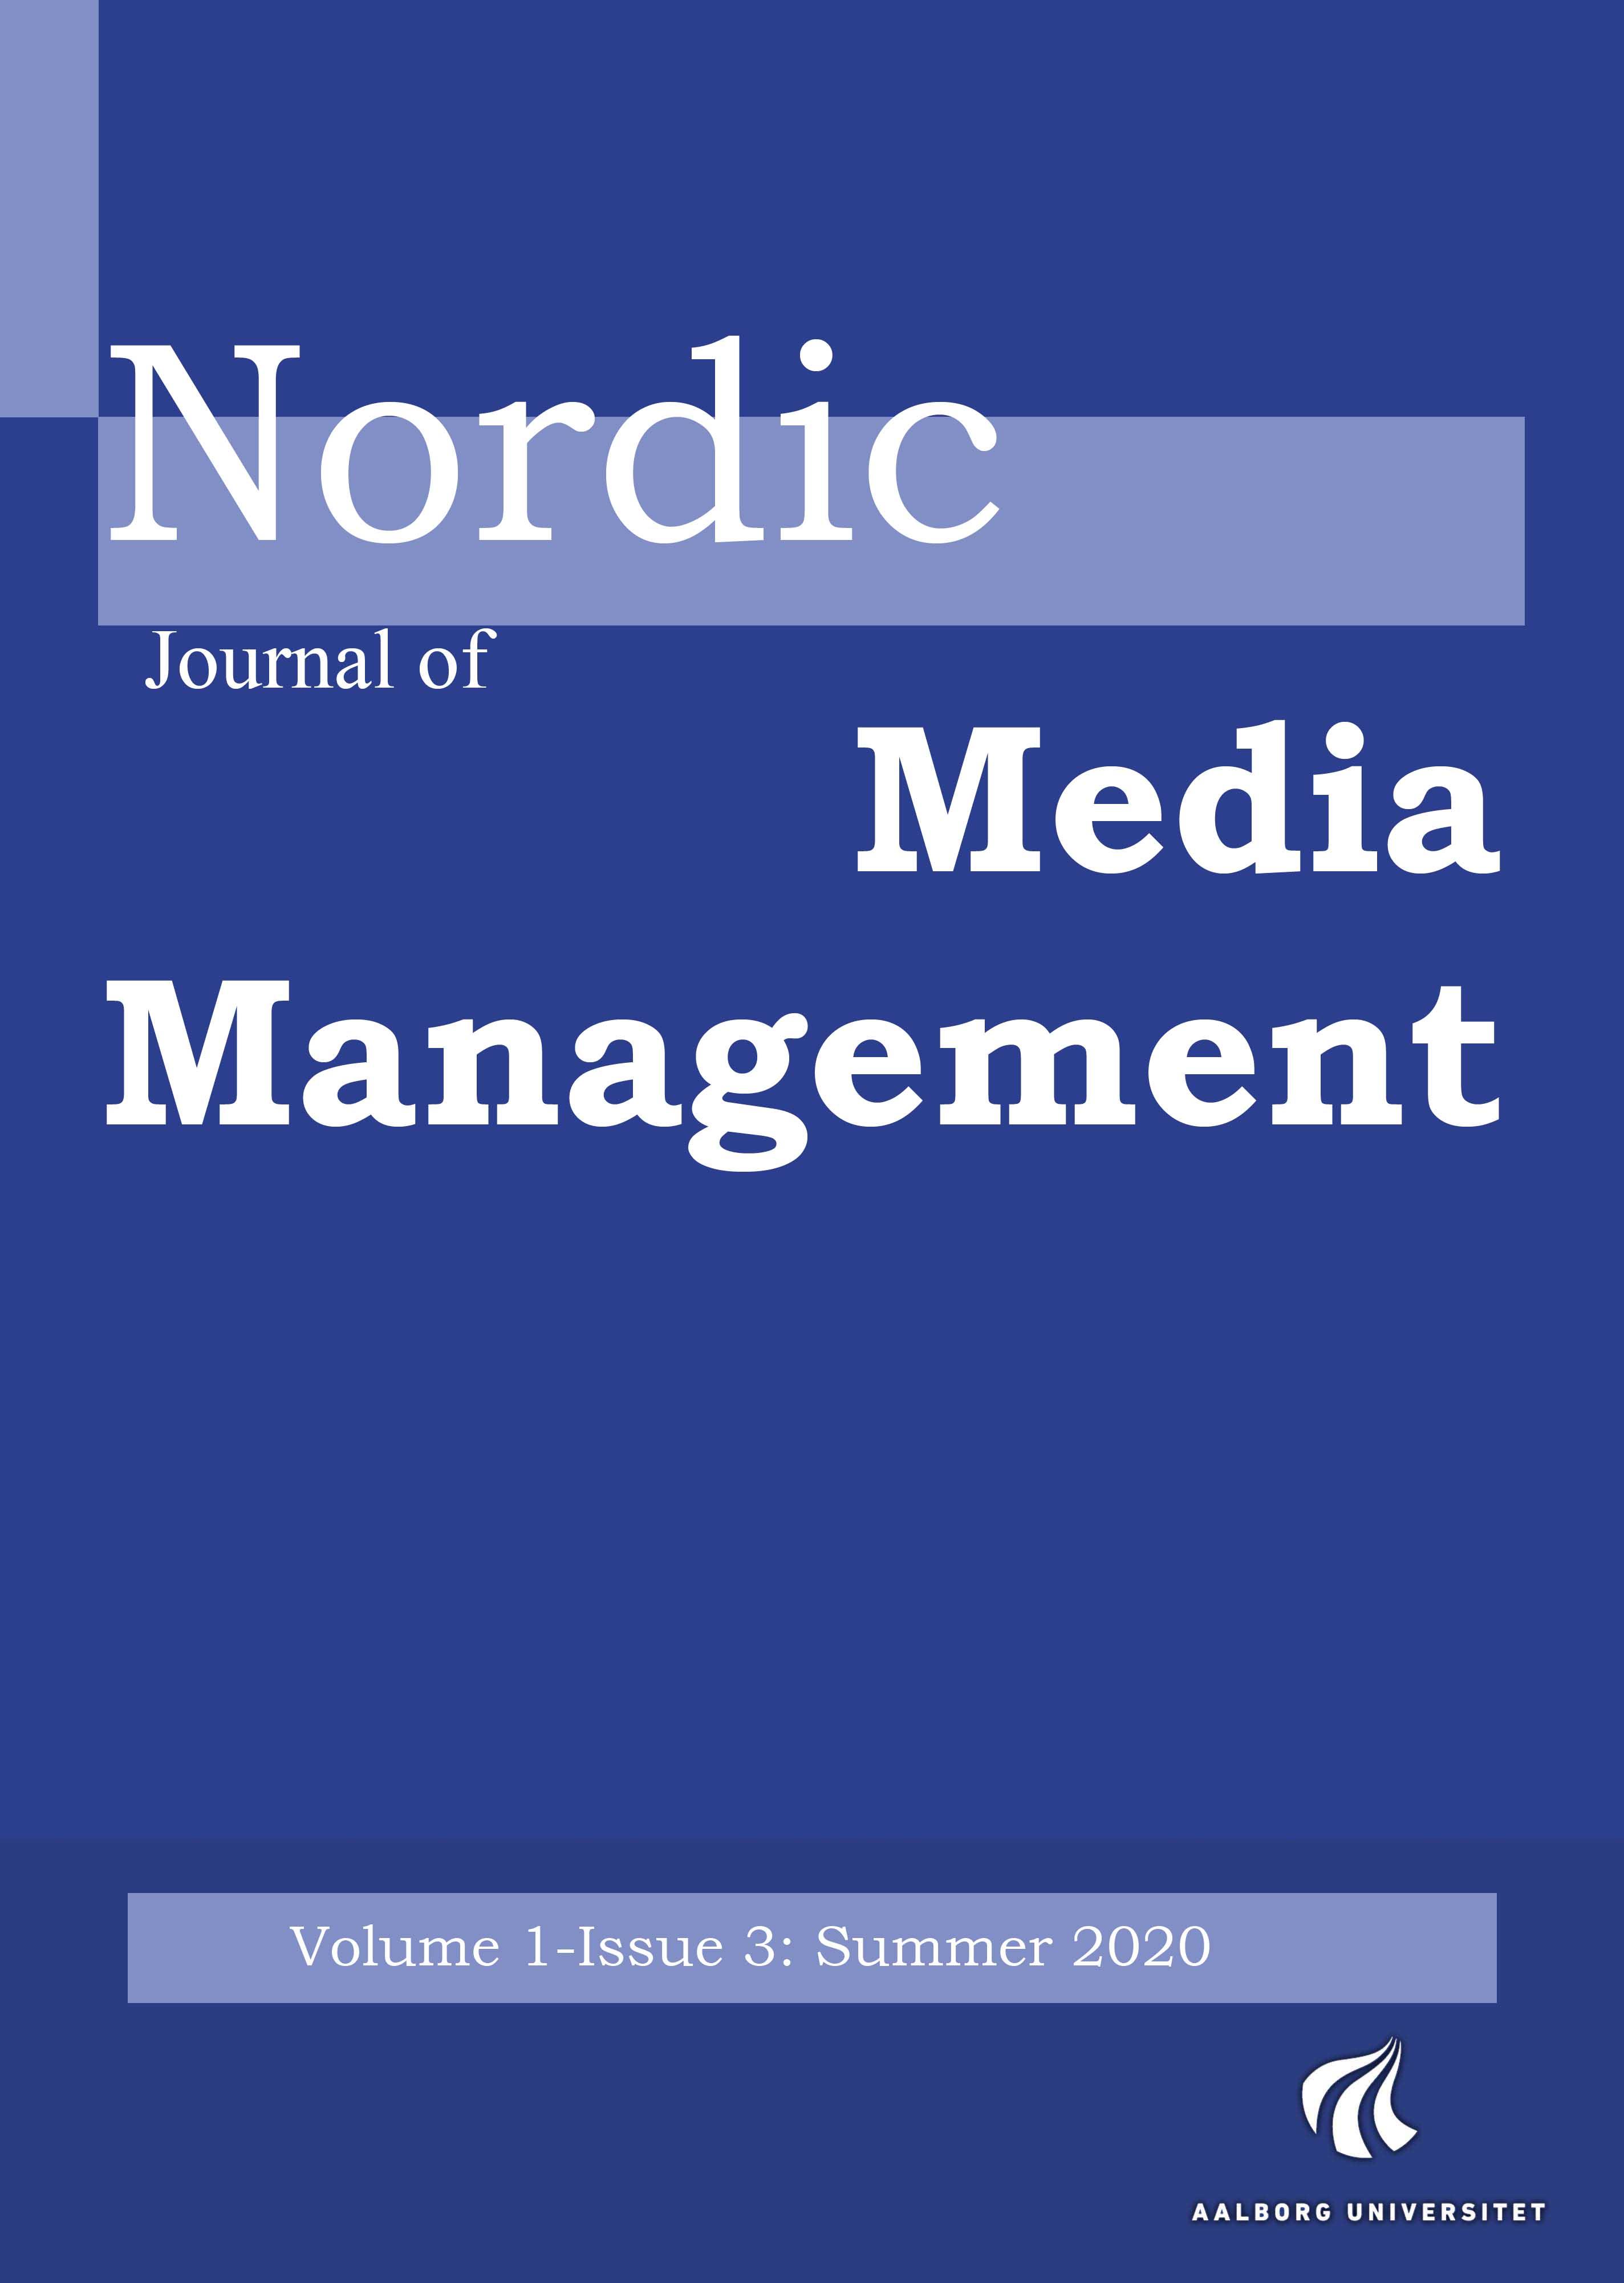 Nordic Journal of Media Management 1(3)